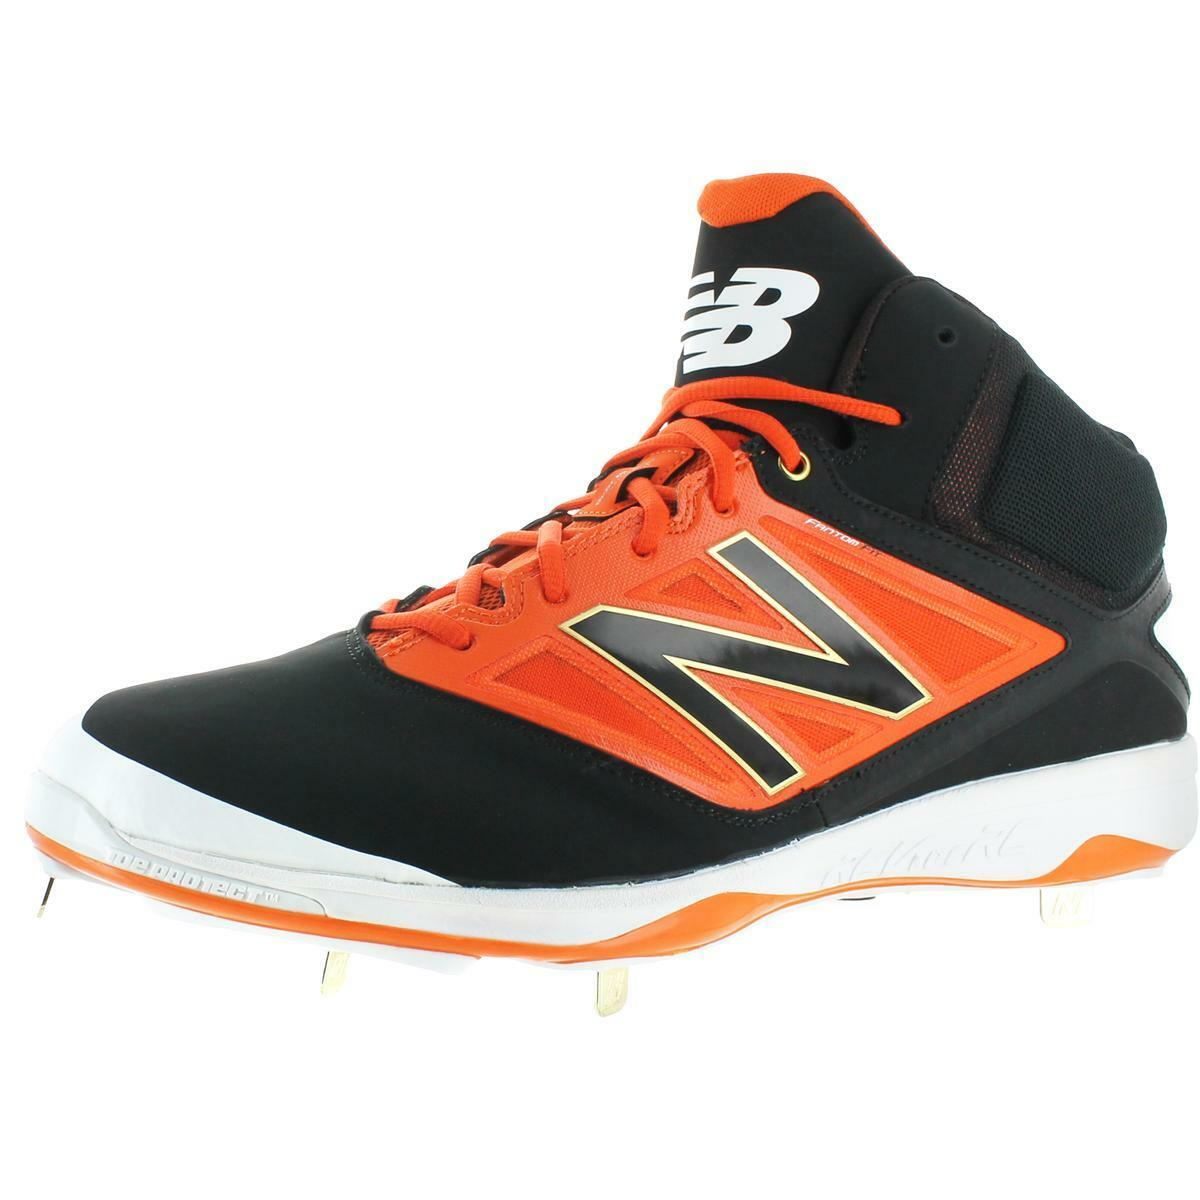 Atlético de béisbol para hombre New Zapatos Balance Con Cordones Botines Zapatos New  BHFO 0741 5010c7